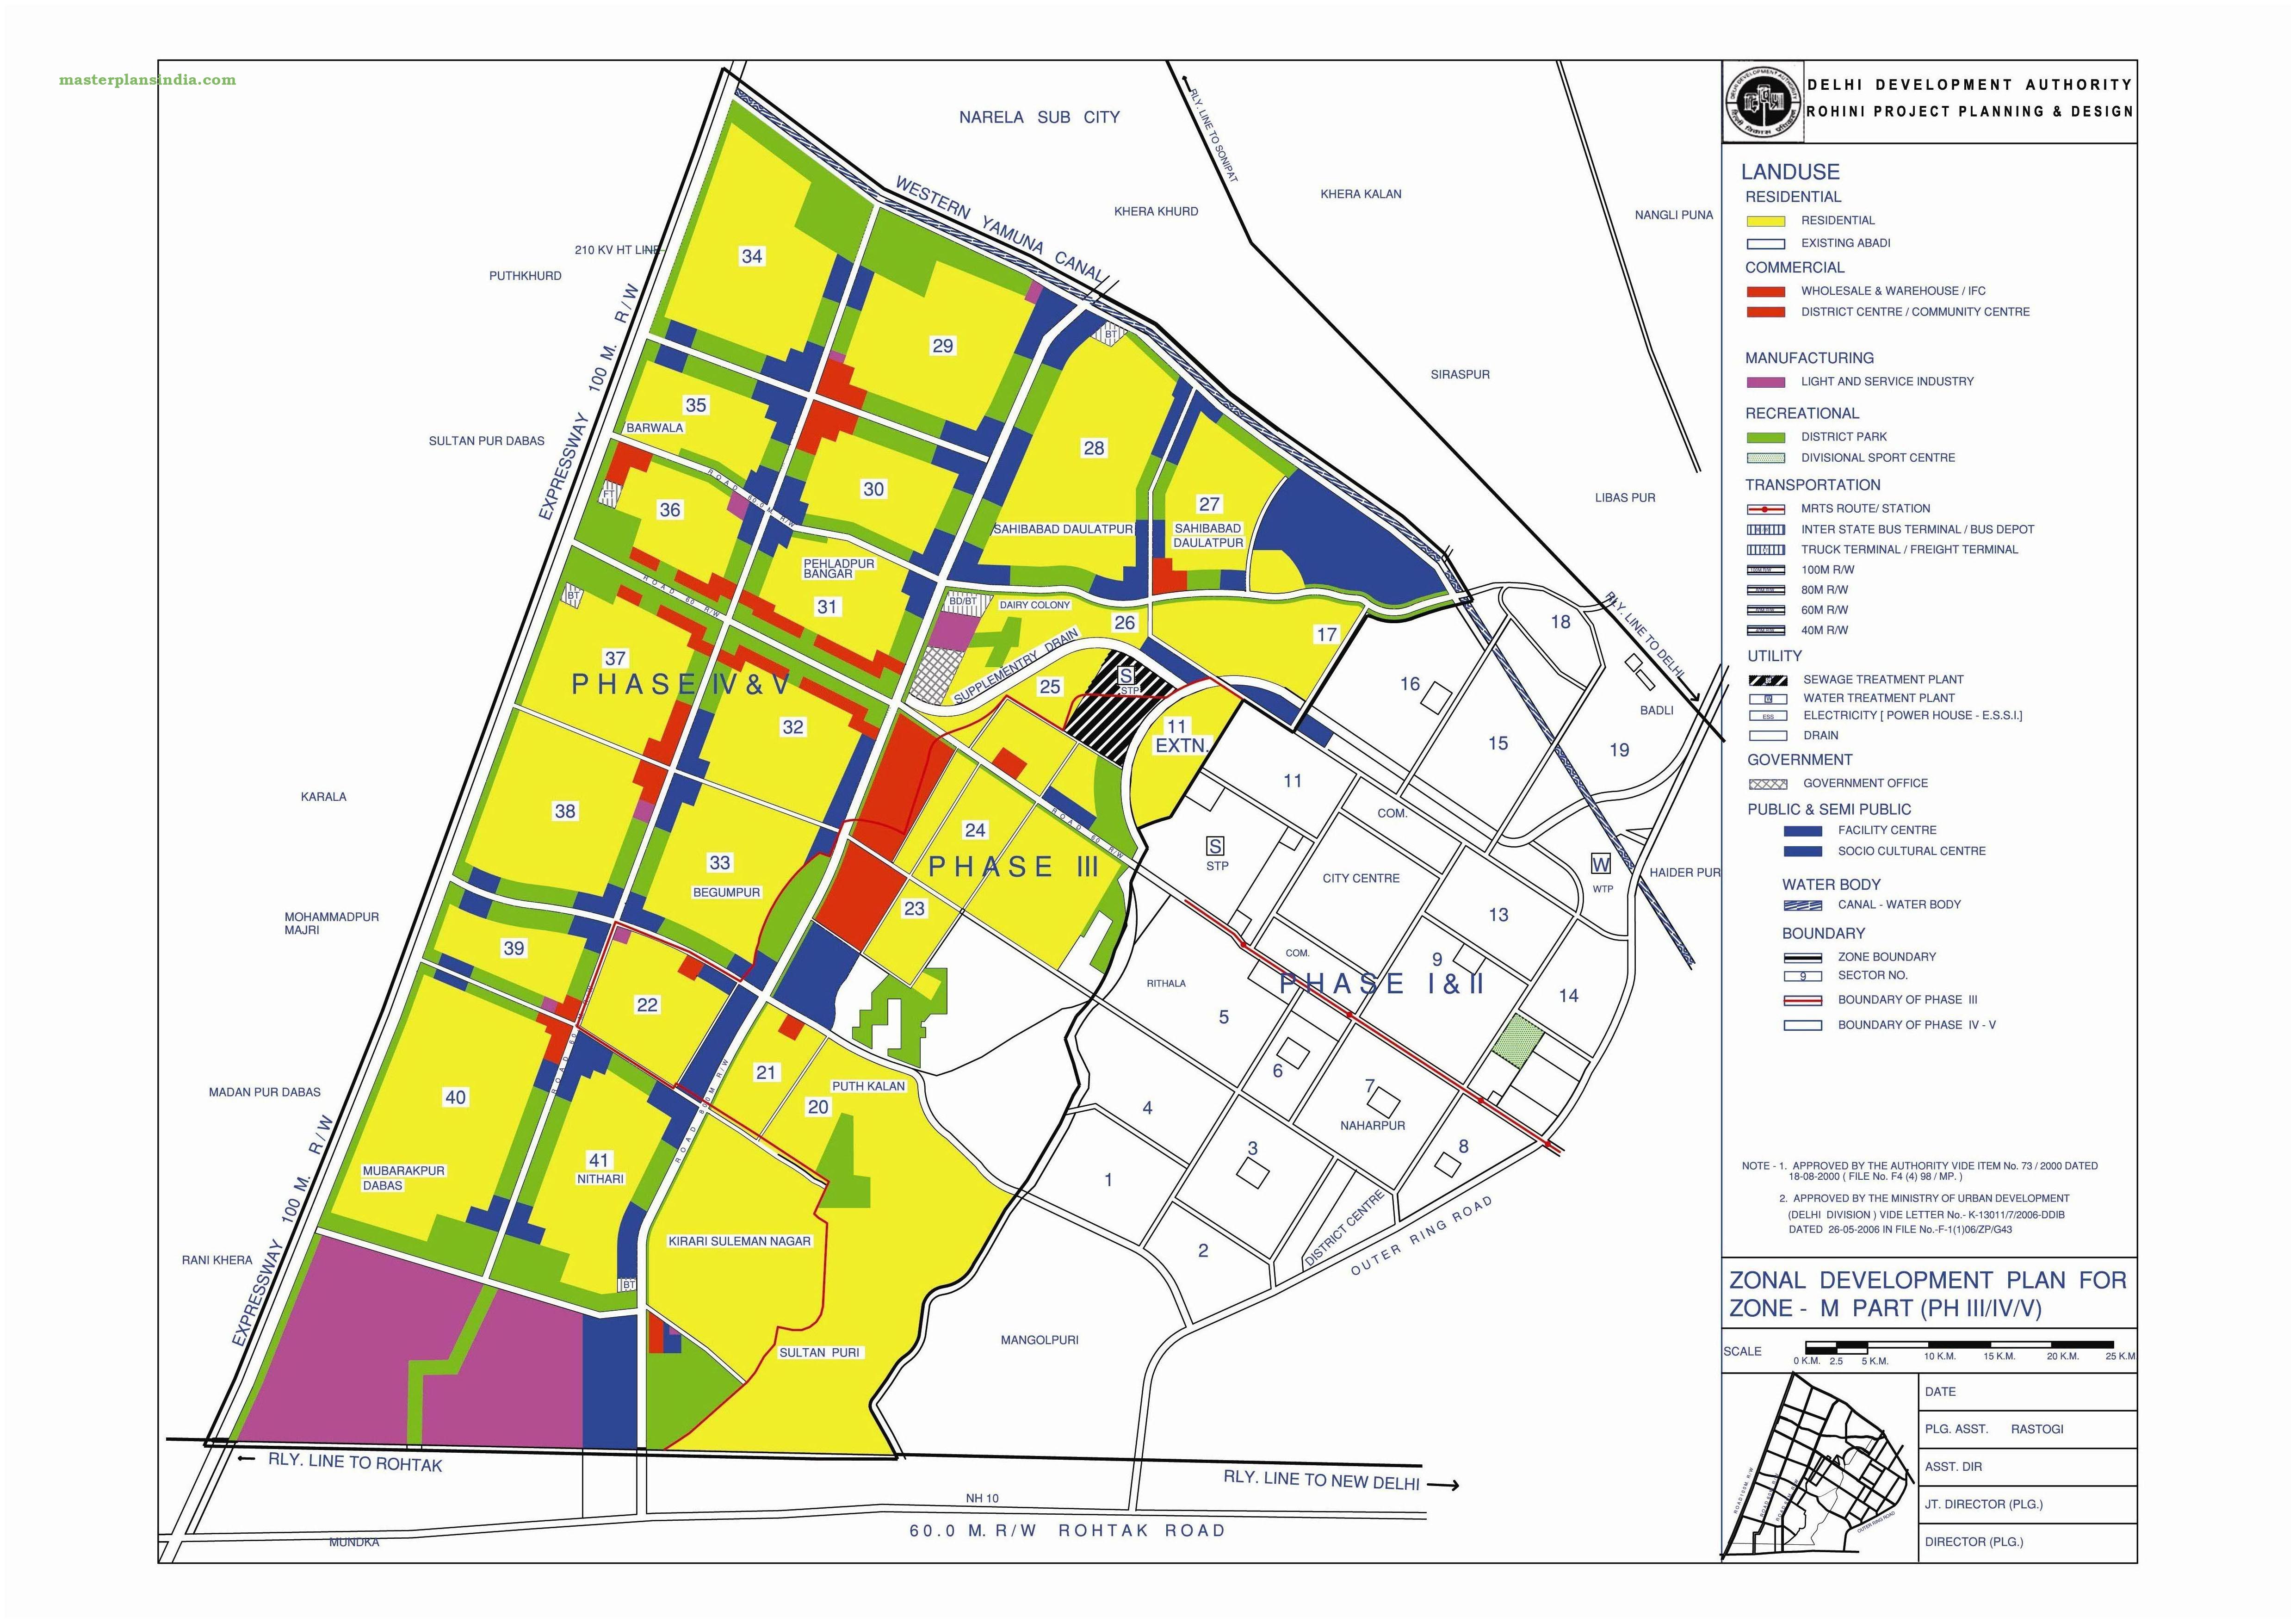 Zonal development plan map zone m north west delhi 2 pdf for Zone plan